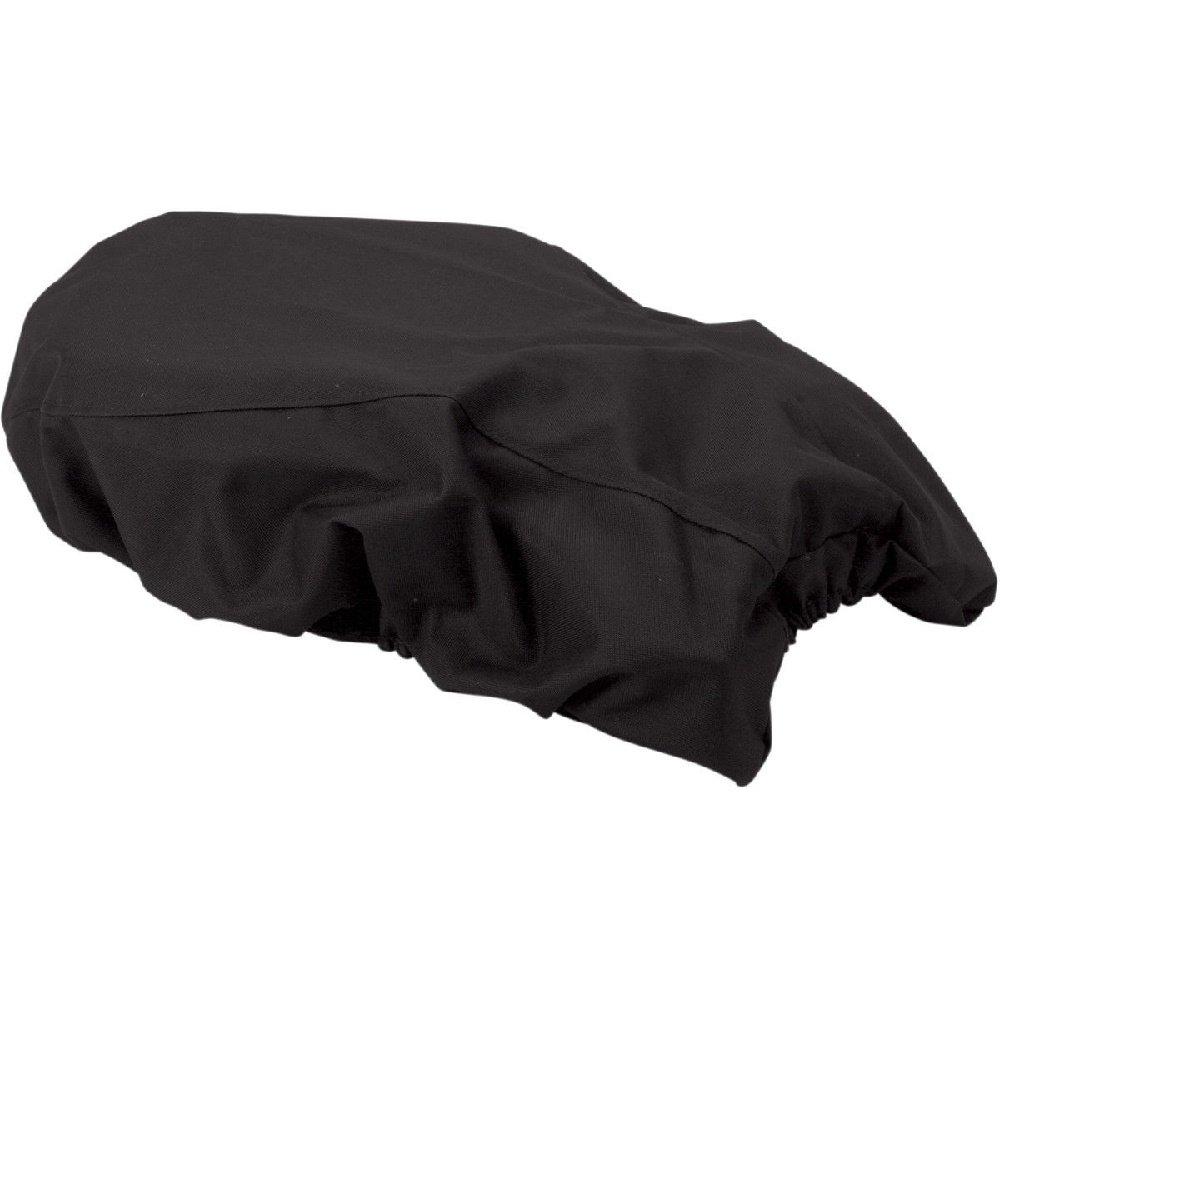 Black 2004-2006 Yamaha YFM350 Bruin ATV Seat Cover